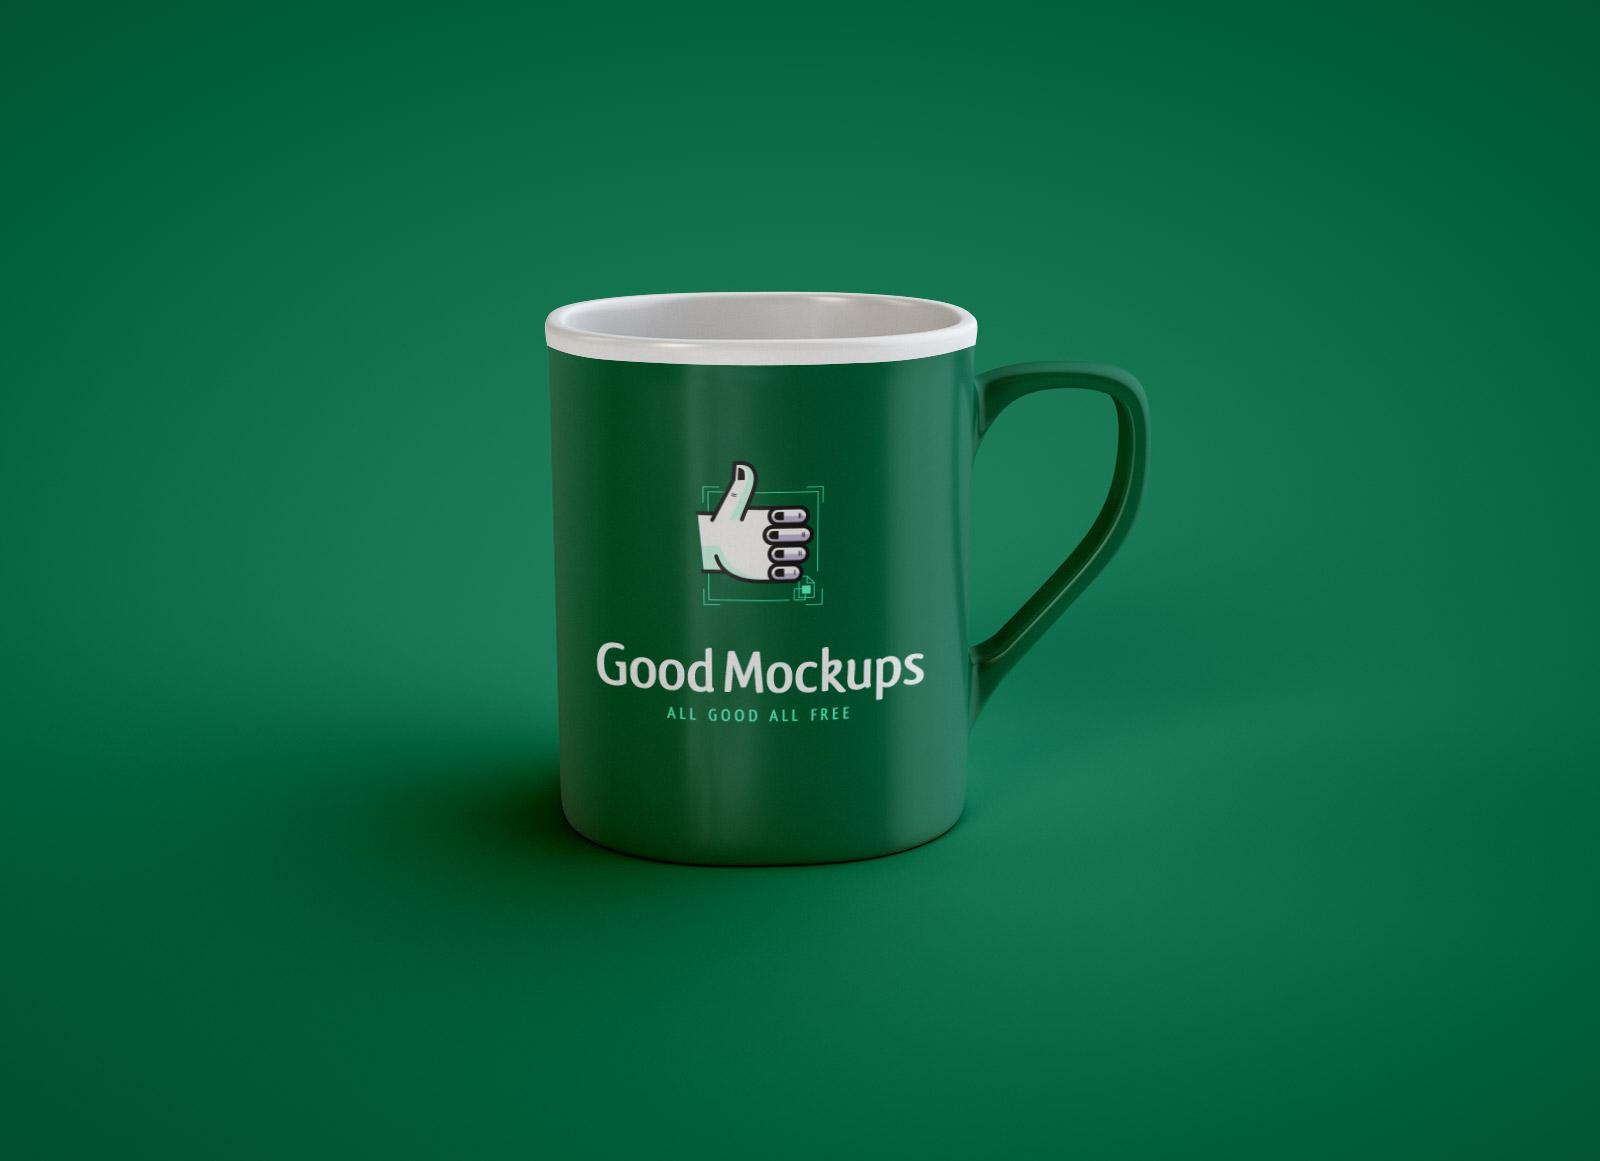 free coffee mug mockup psd 2